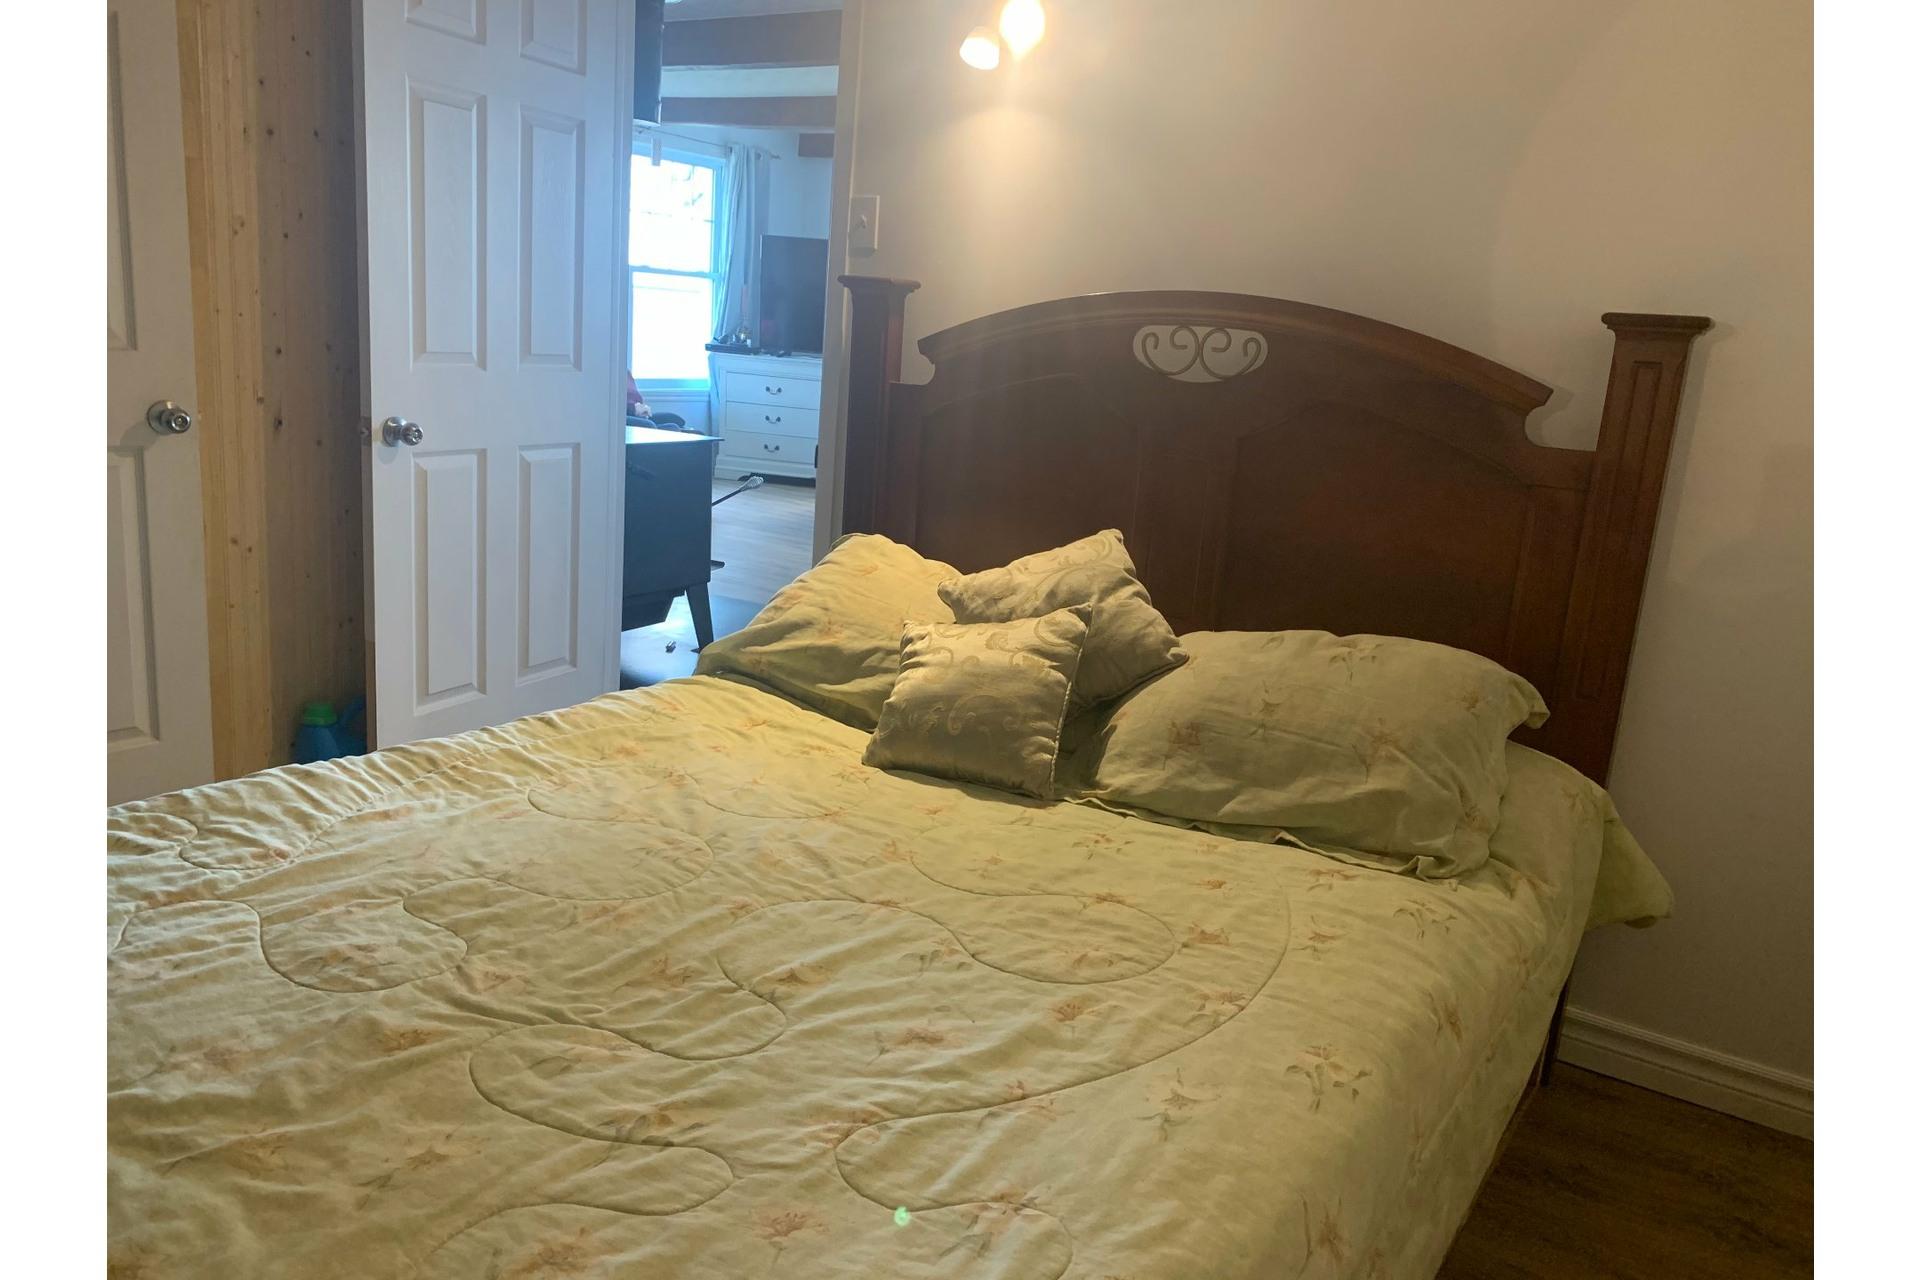 image 9 - Farmhouse For sale Saint-Guillaume - 10 rooms